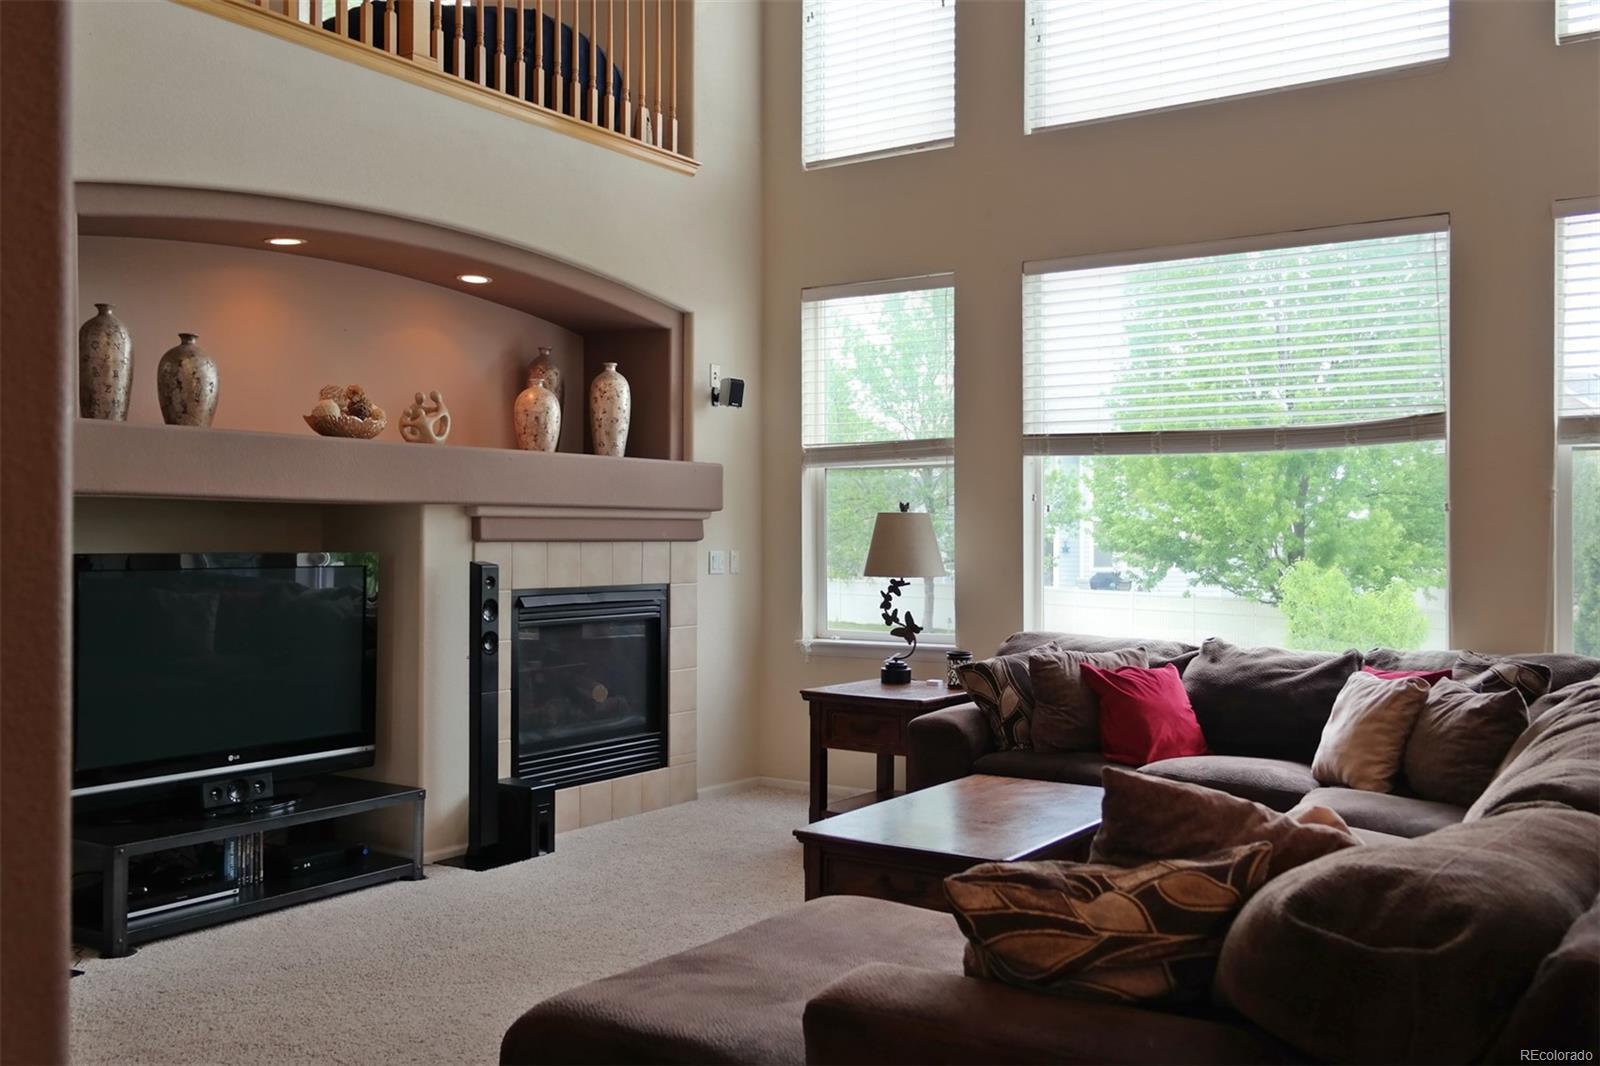 Gas Fireplace & Wall of Windows